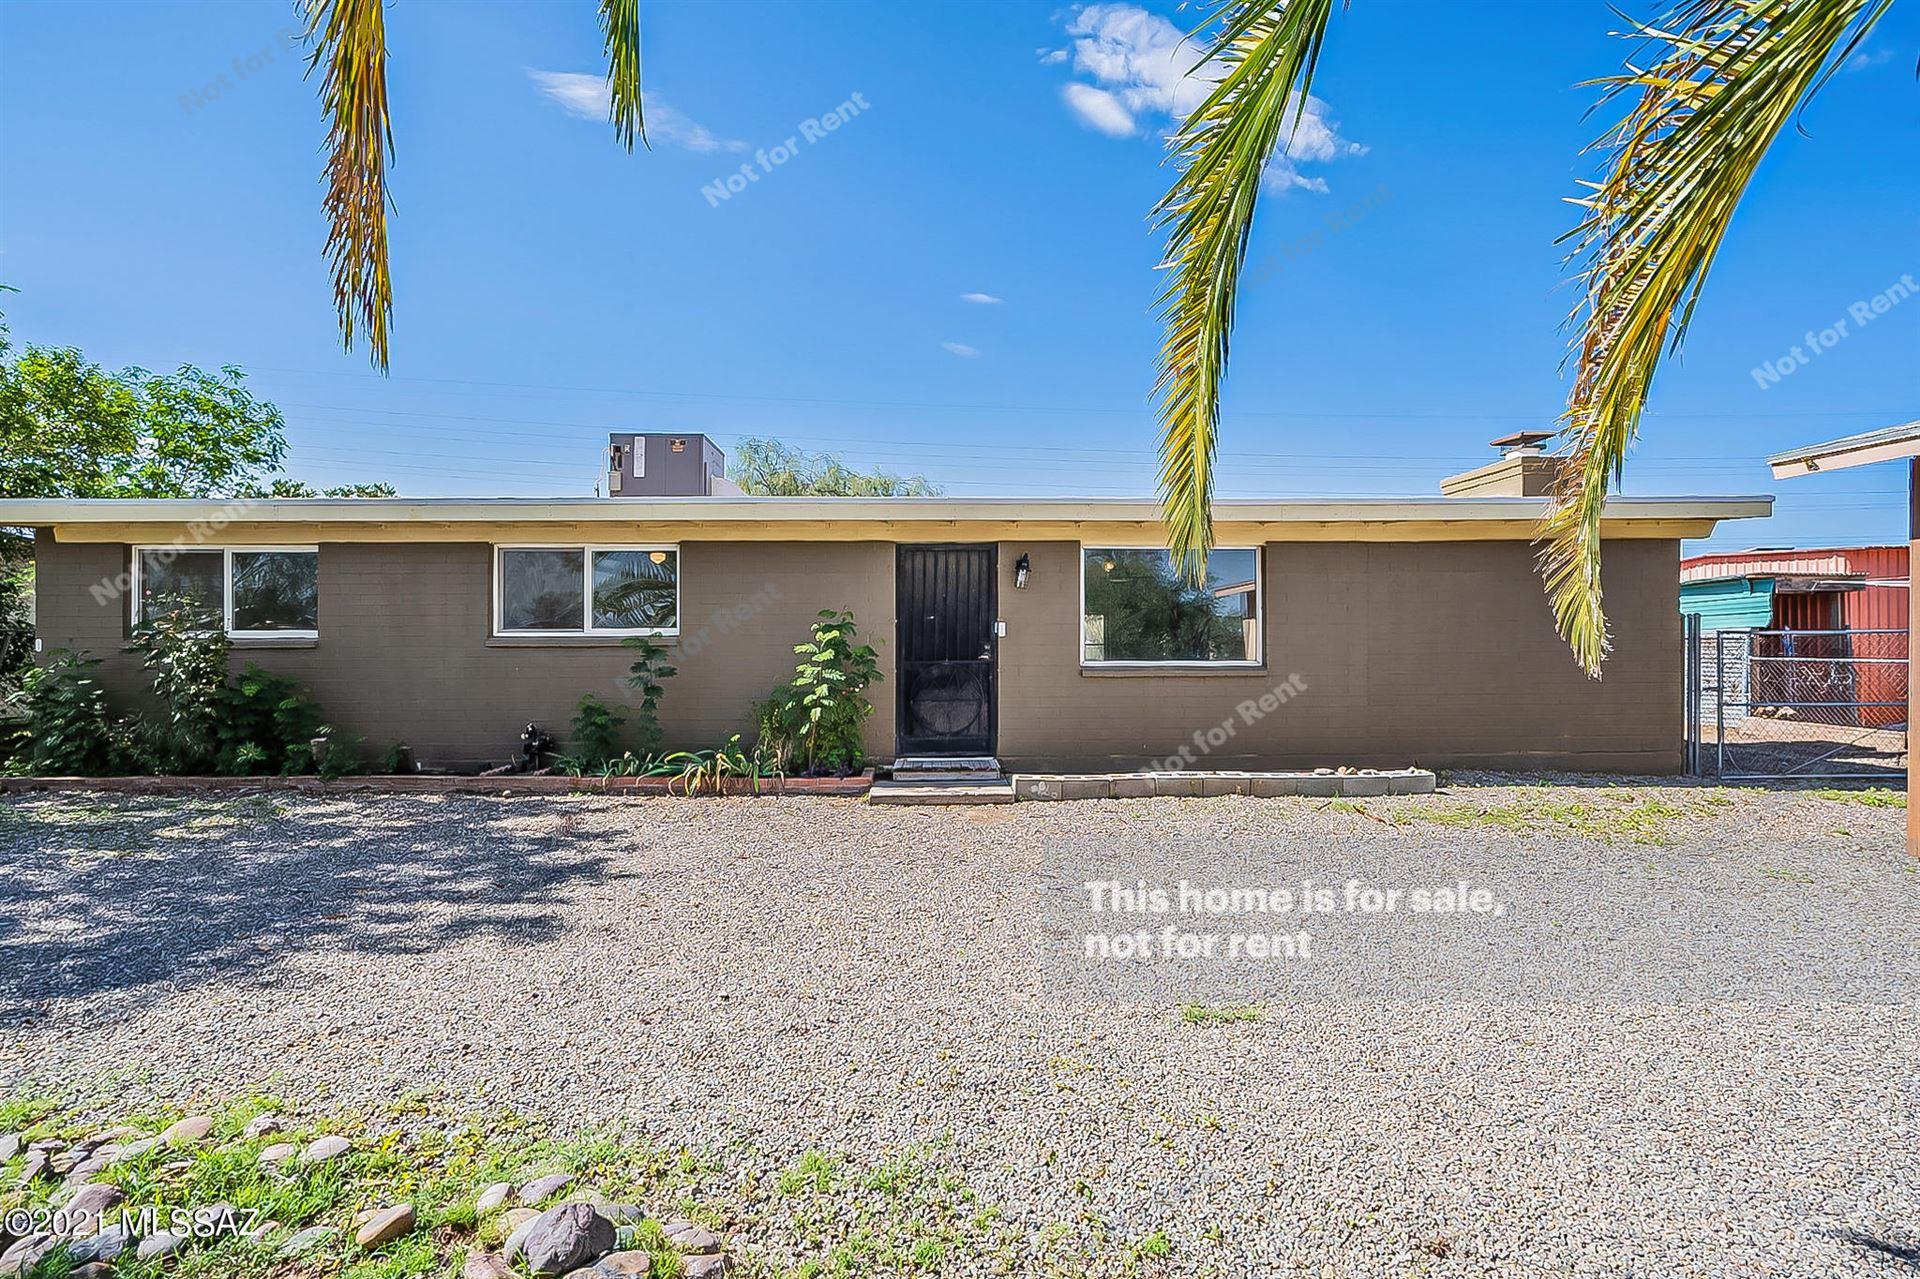 1610 E Virginia Street, Tucson, AZ 85706 - MLS#: 22119841